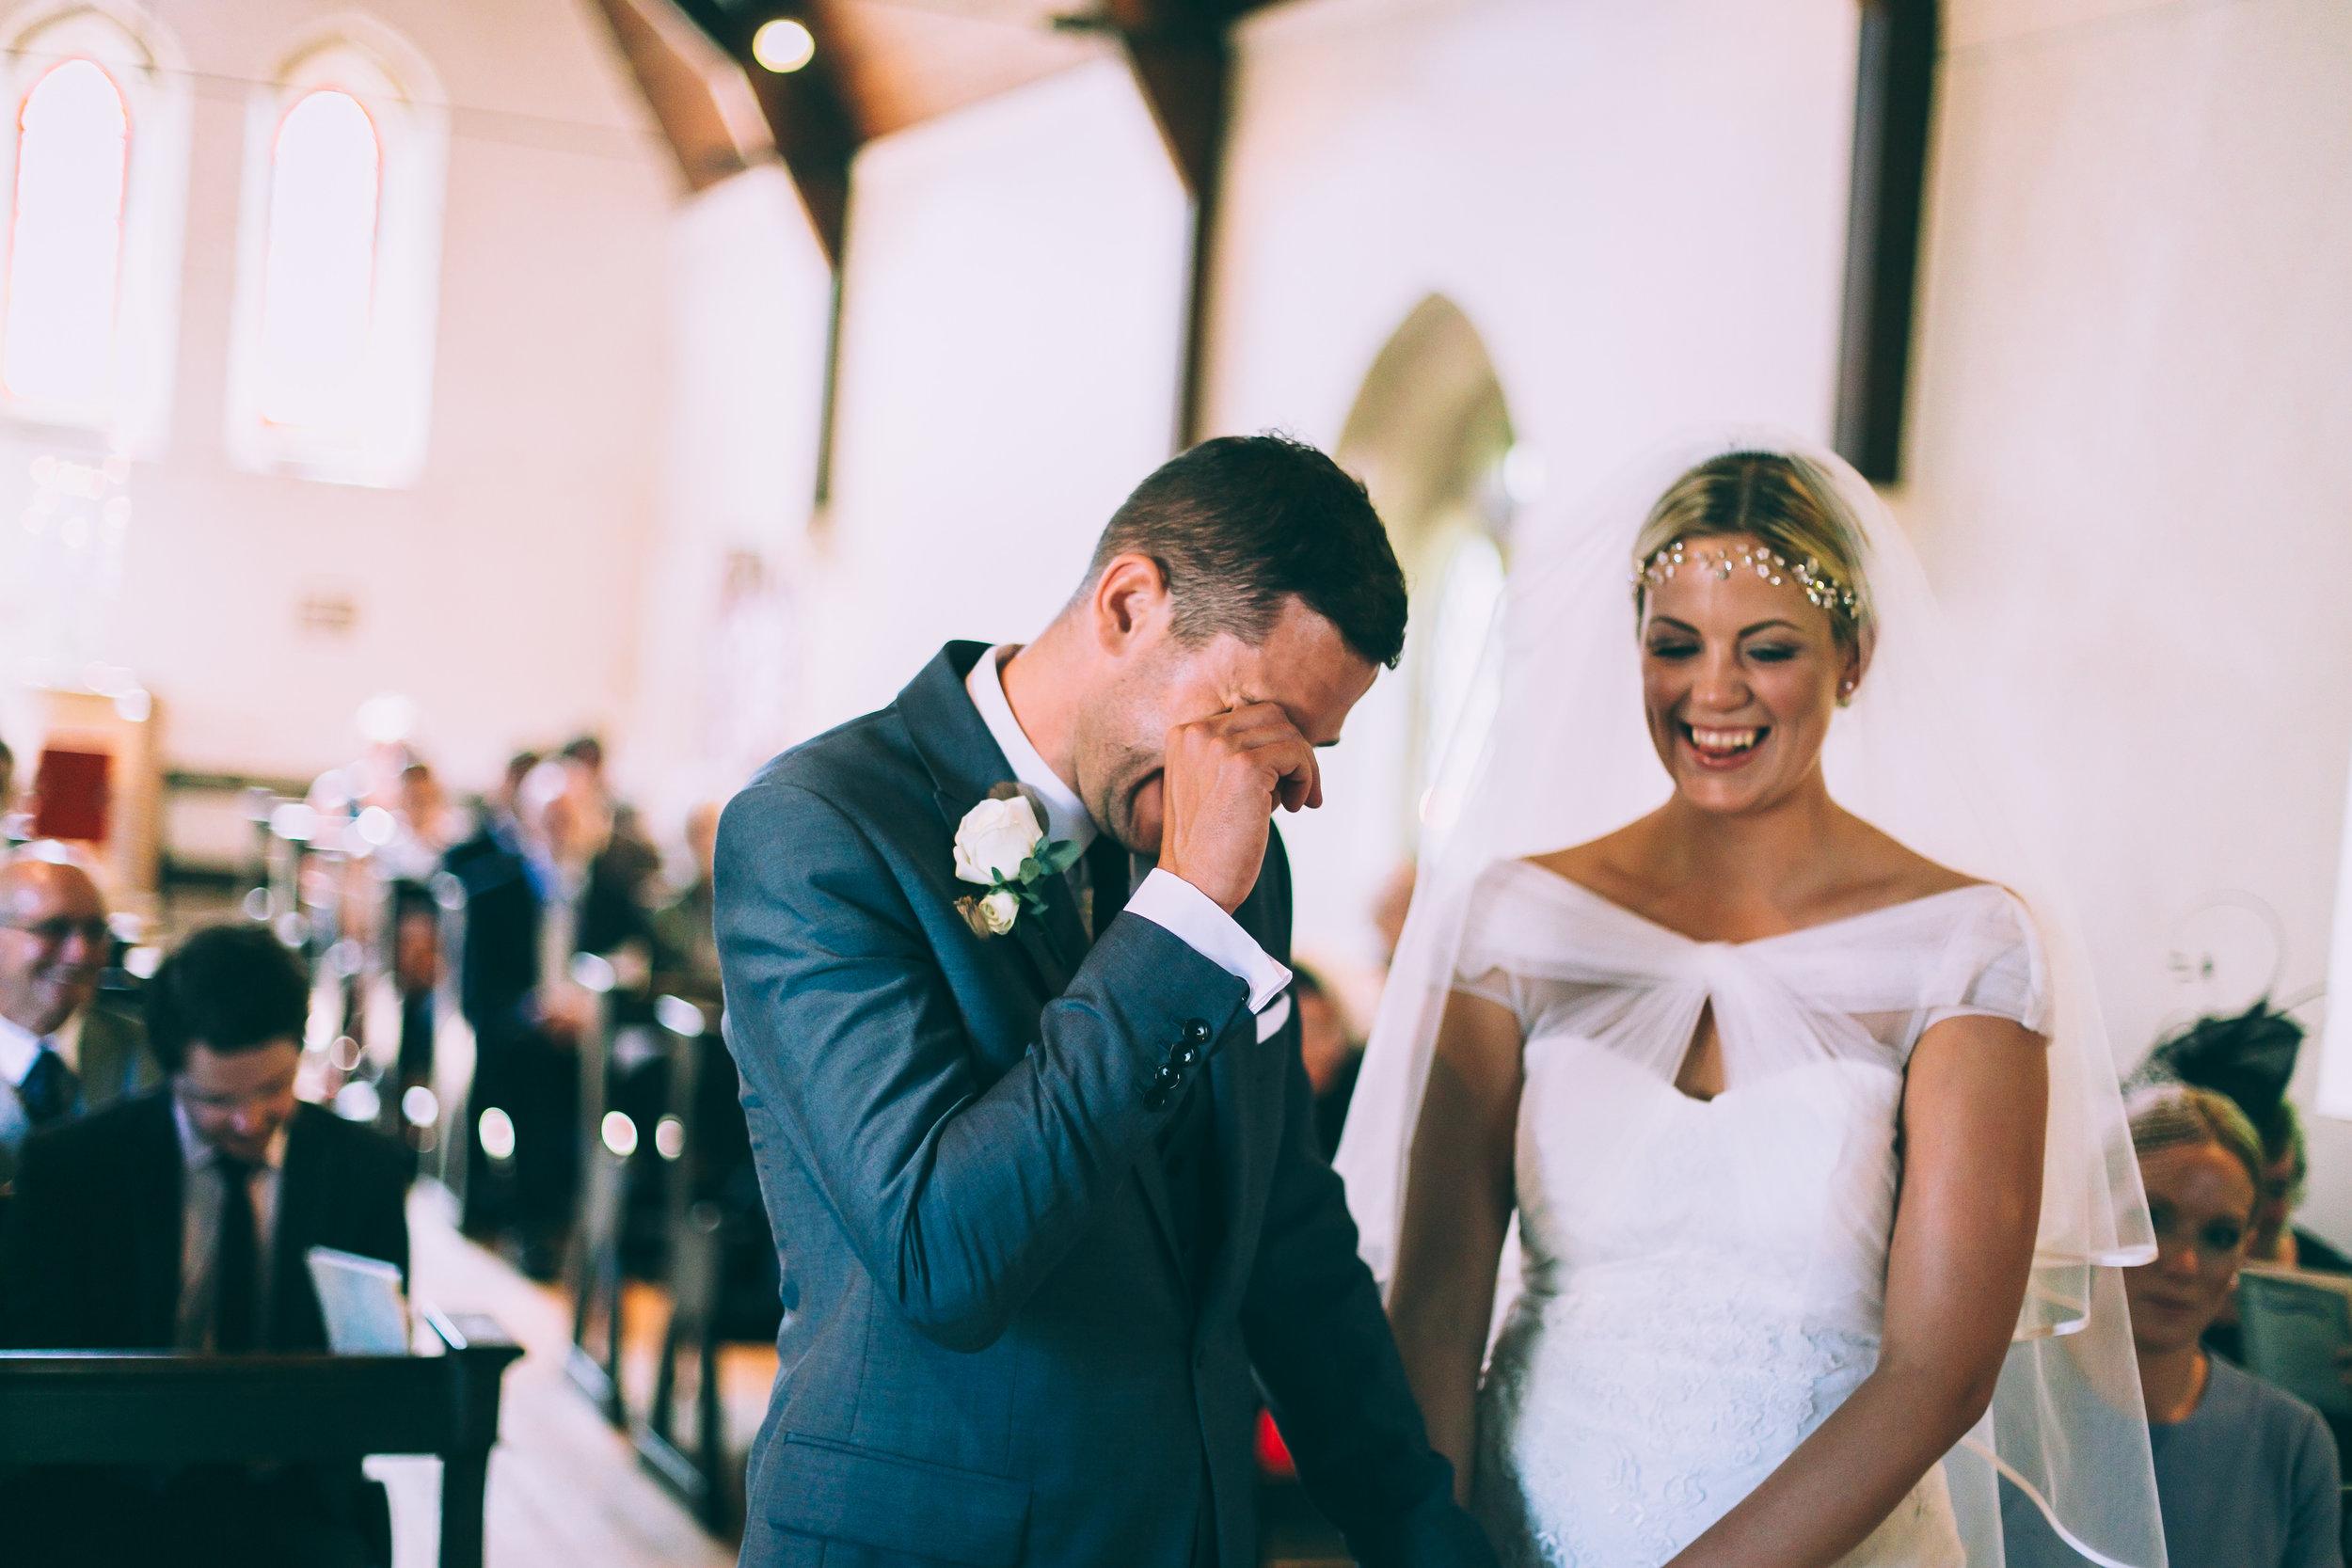 ClairandCraig_wedding_at_raithwaite_hall_tom_biddle_tb201.jpg